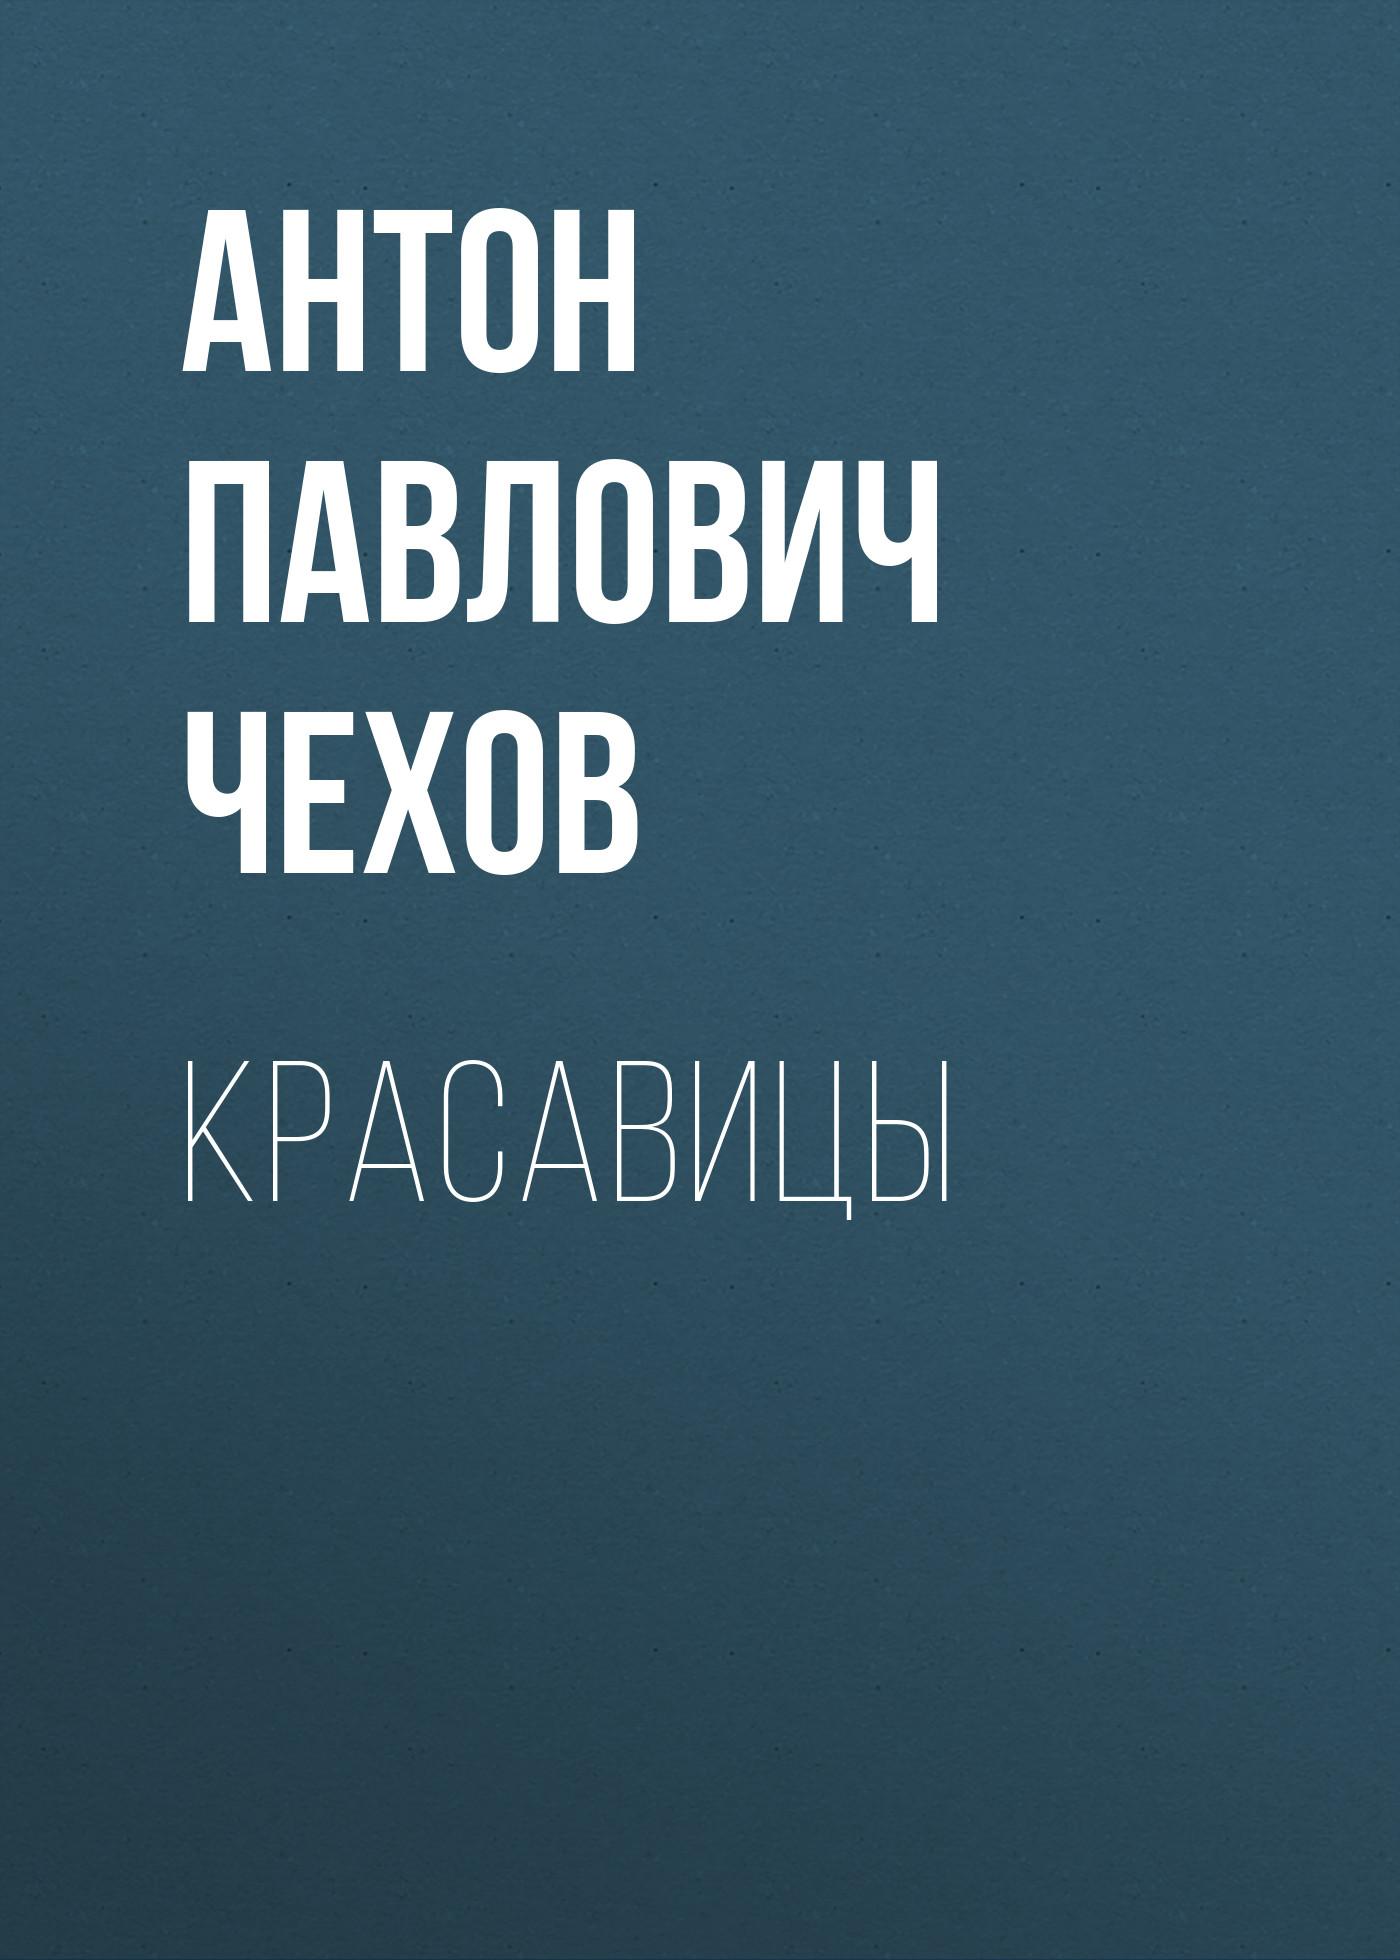 Антон Чехов Красавицы антон алексеевич воробьев семь волос красавицы авбёлль